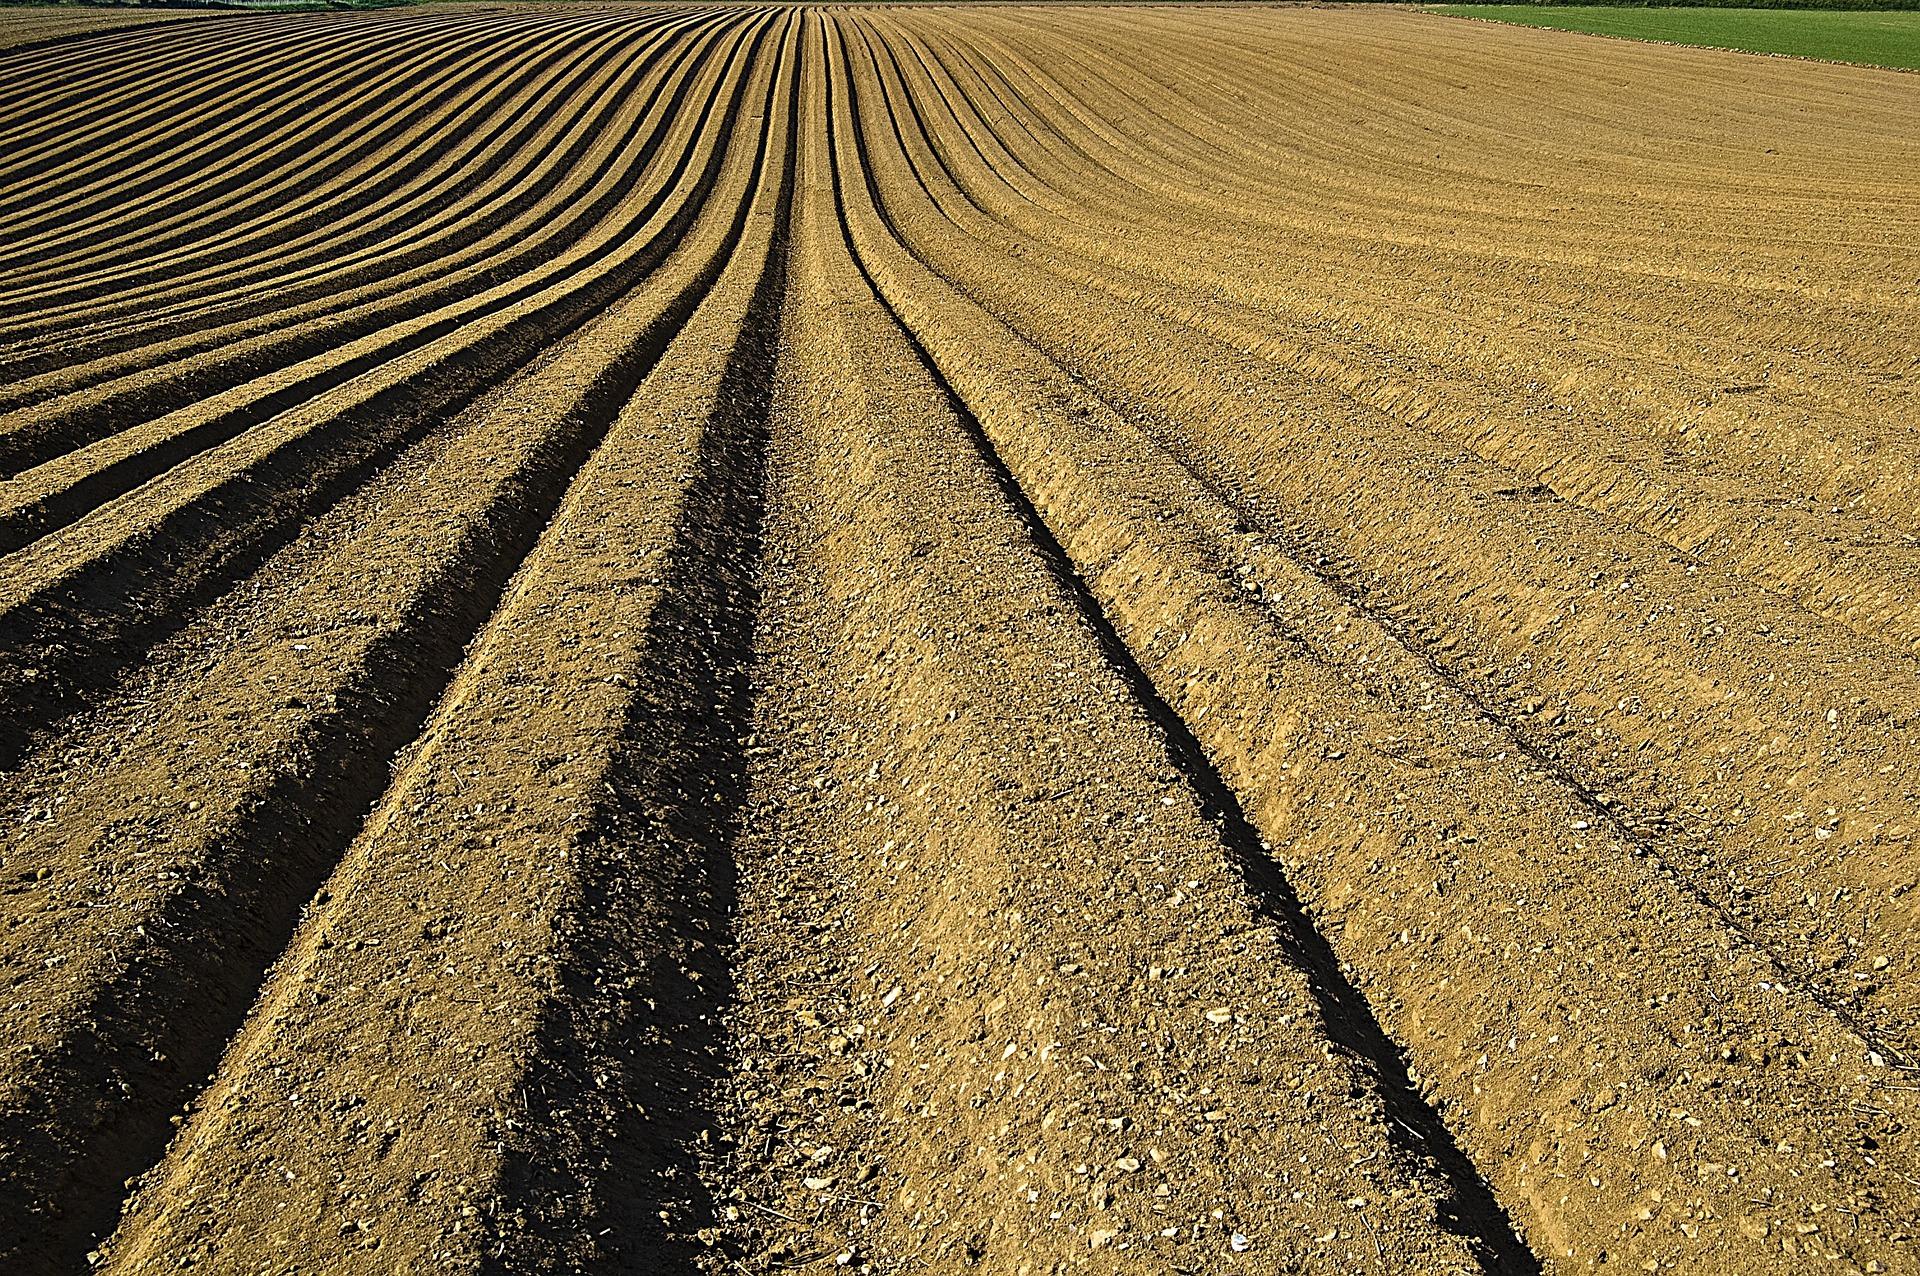 A farm plot tilled with fertilizer.